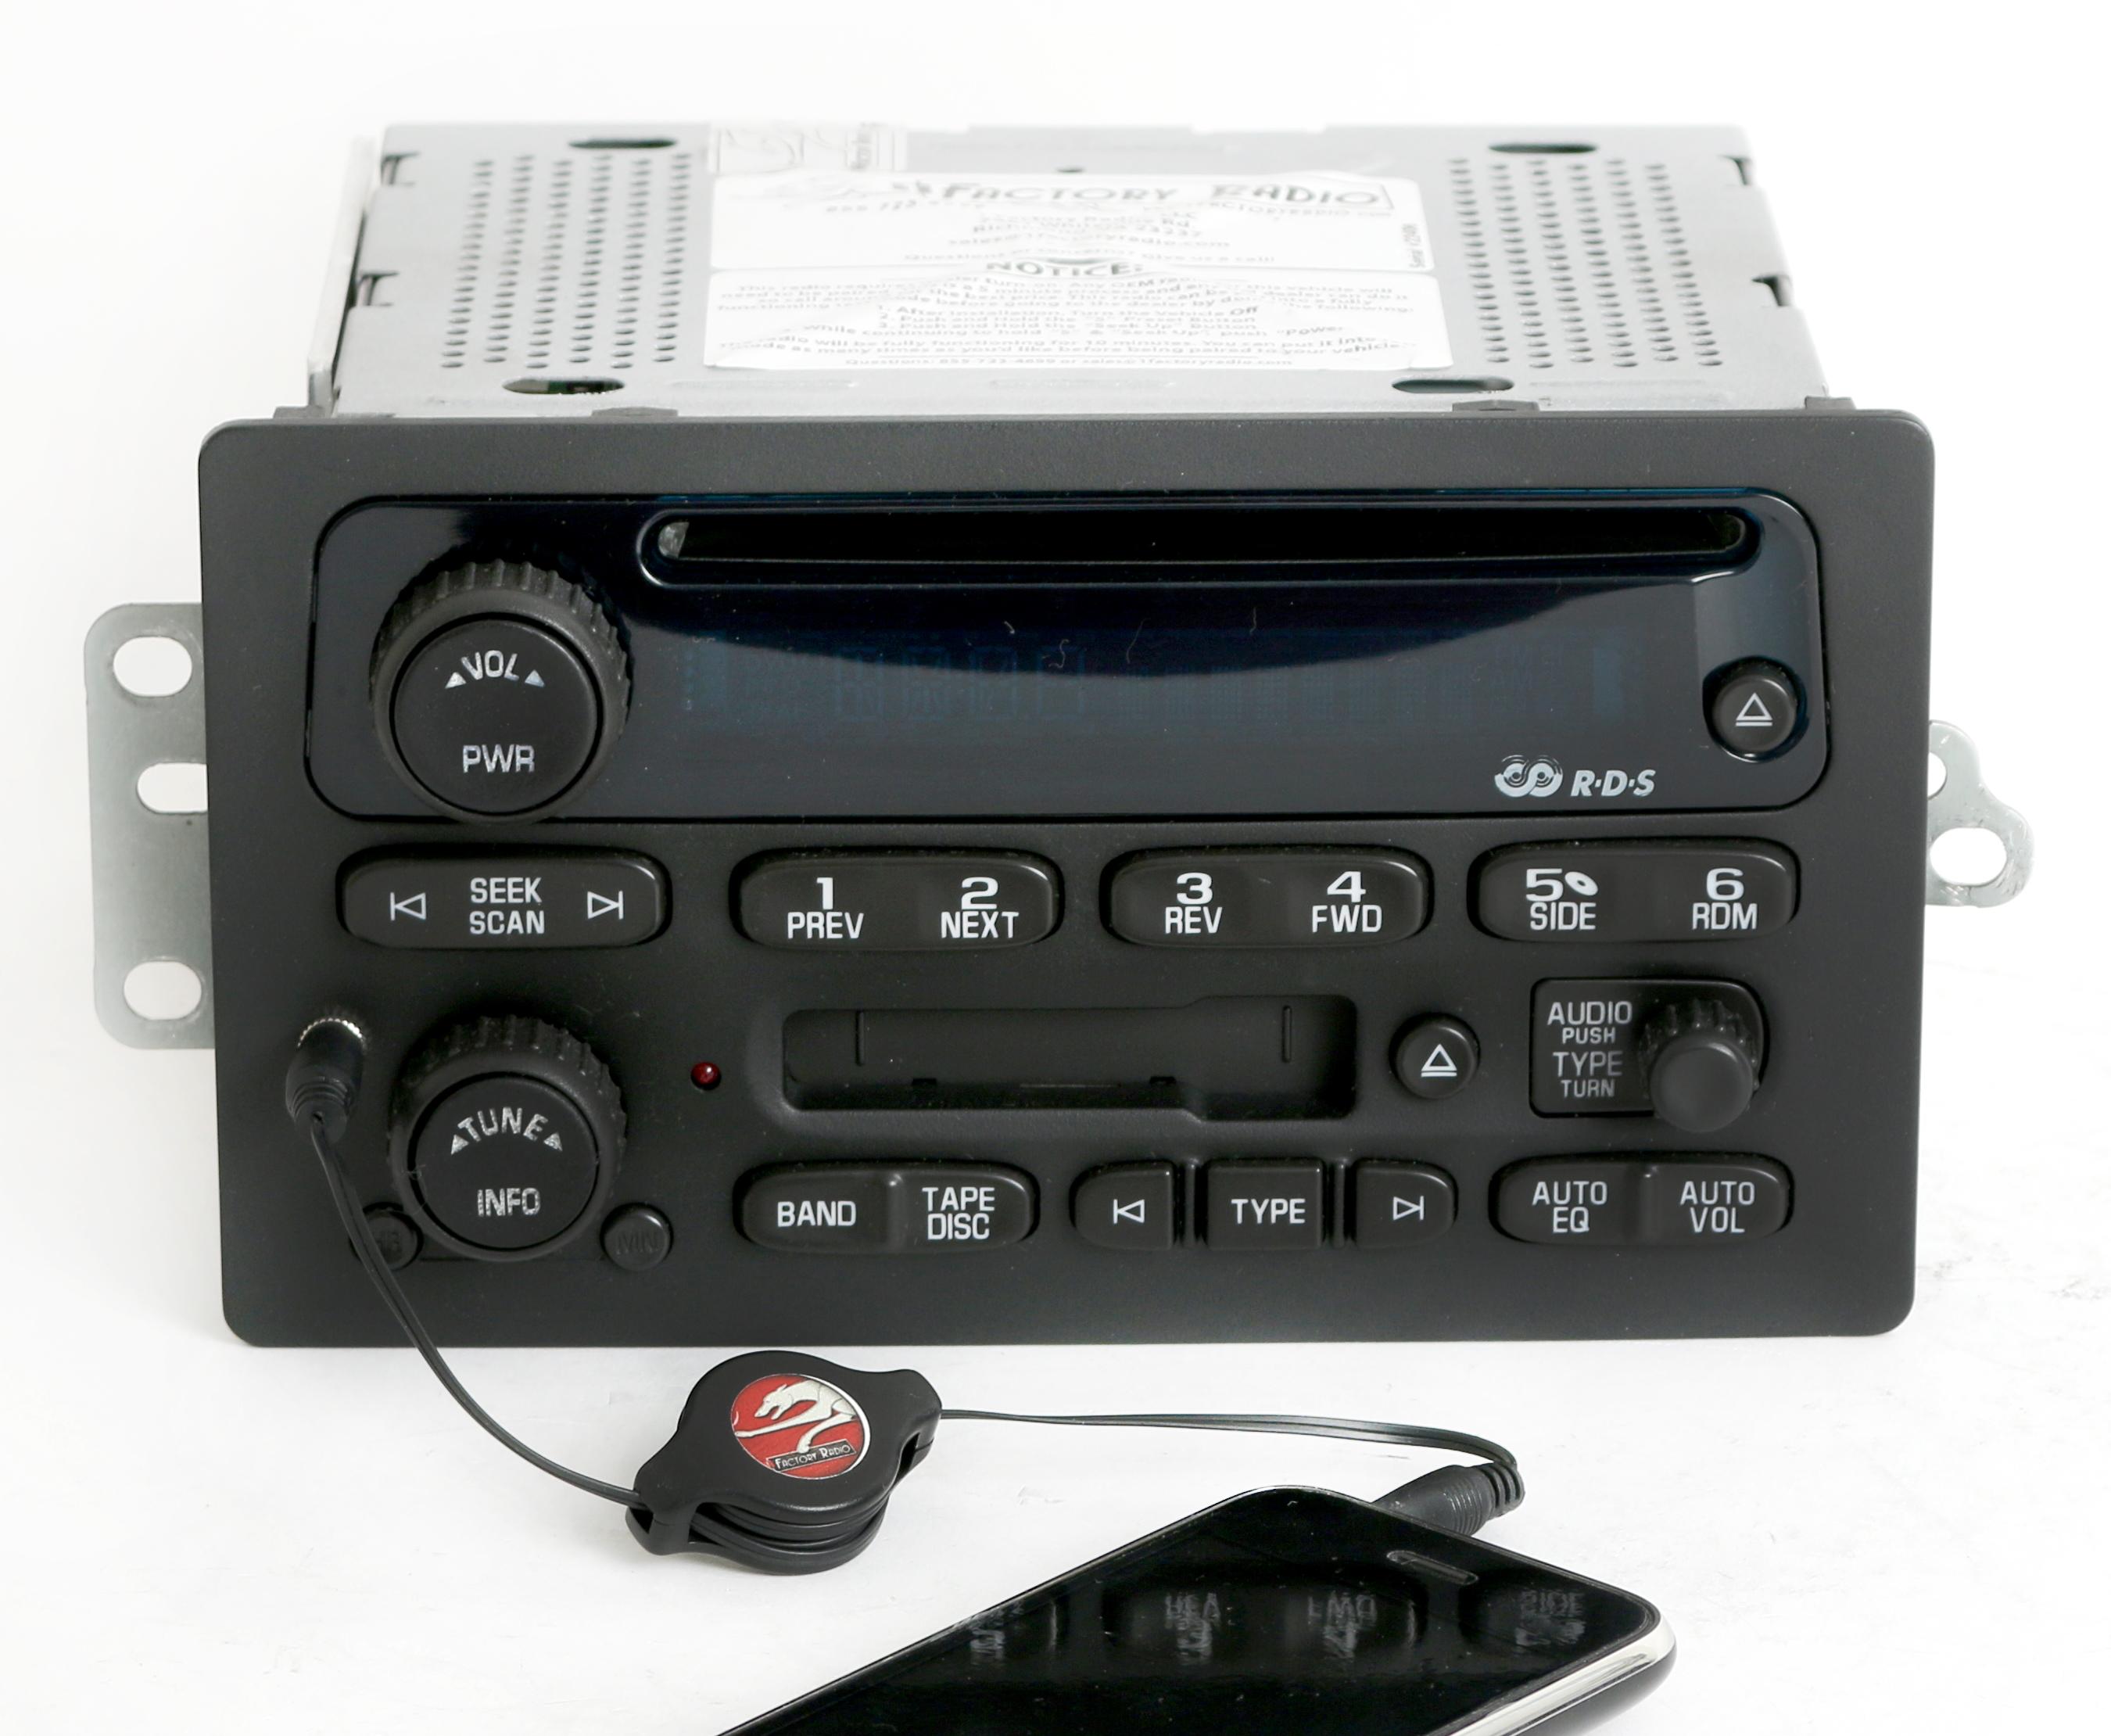 Delphi Delco Electronics Car Stereo Receivers Sears